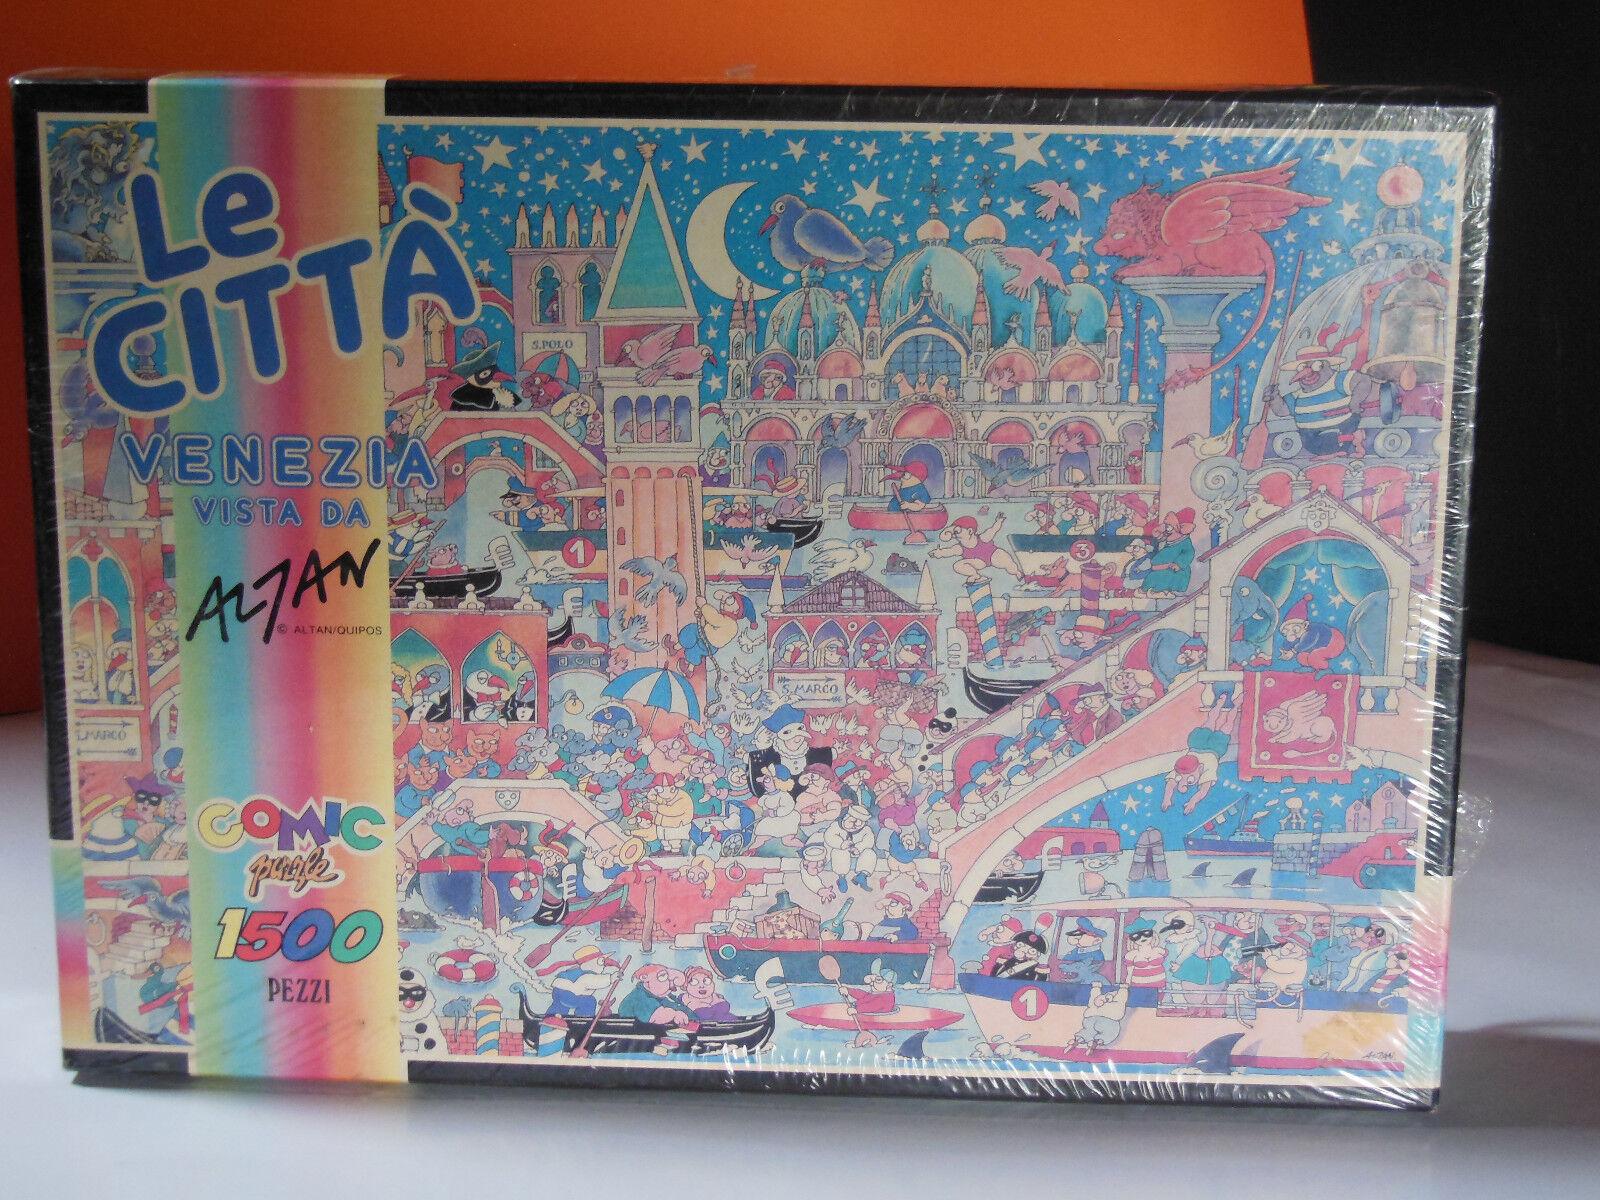 Puzzle Venezia Vista da Altan 1500 pezzi Franco Panini Carterie made in Italy | Léger  | Sortie  | Offre Spéciale  | Brillance De Couleur